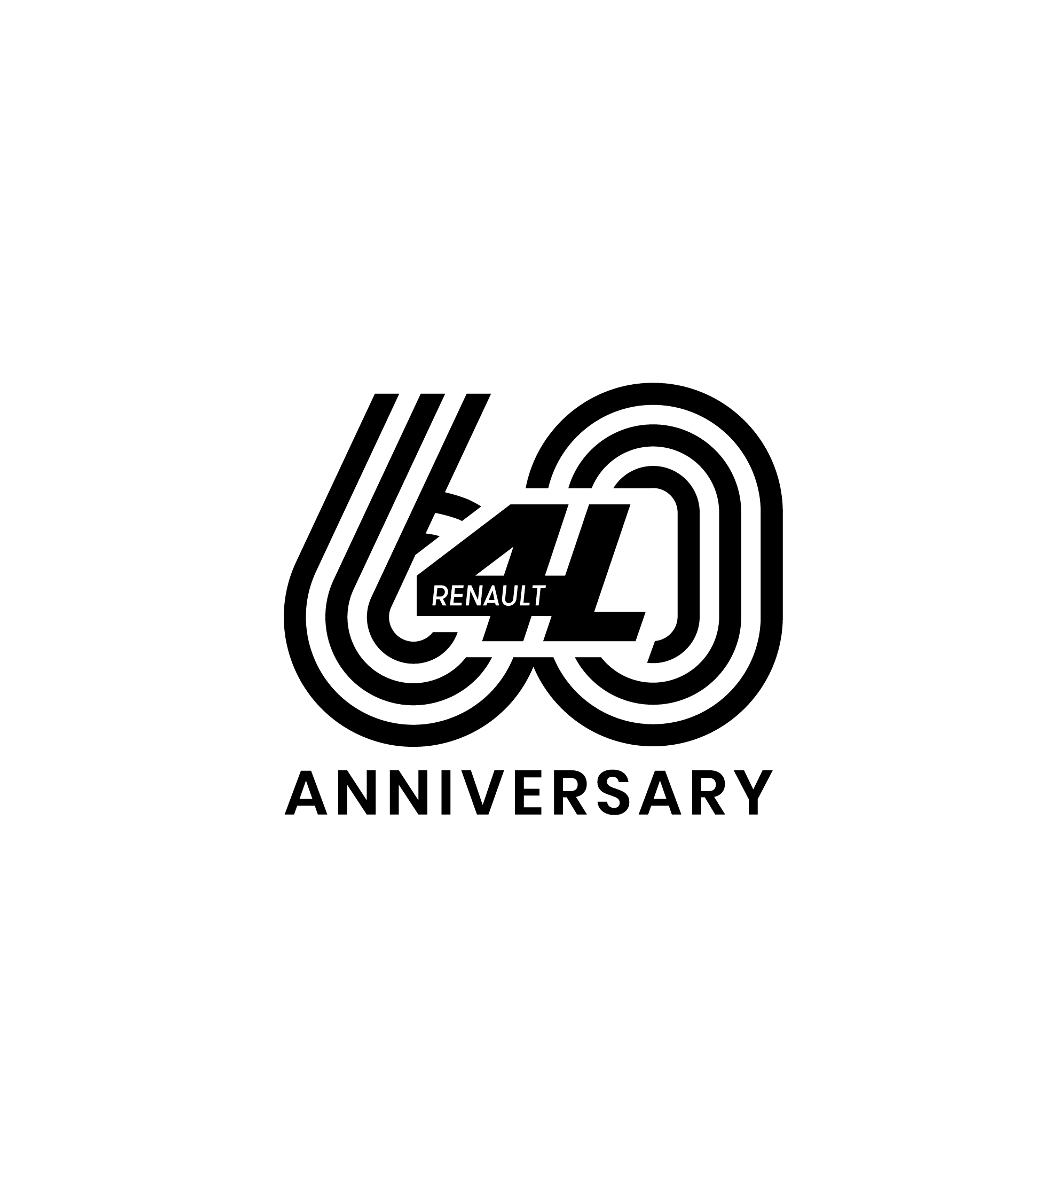 1-2021-logo-anniversaire-60-ans-renault-4l.jpg